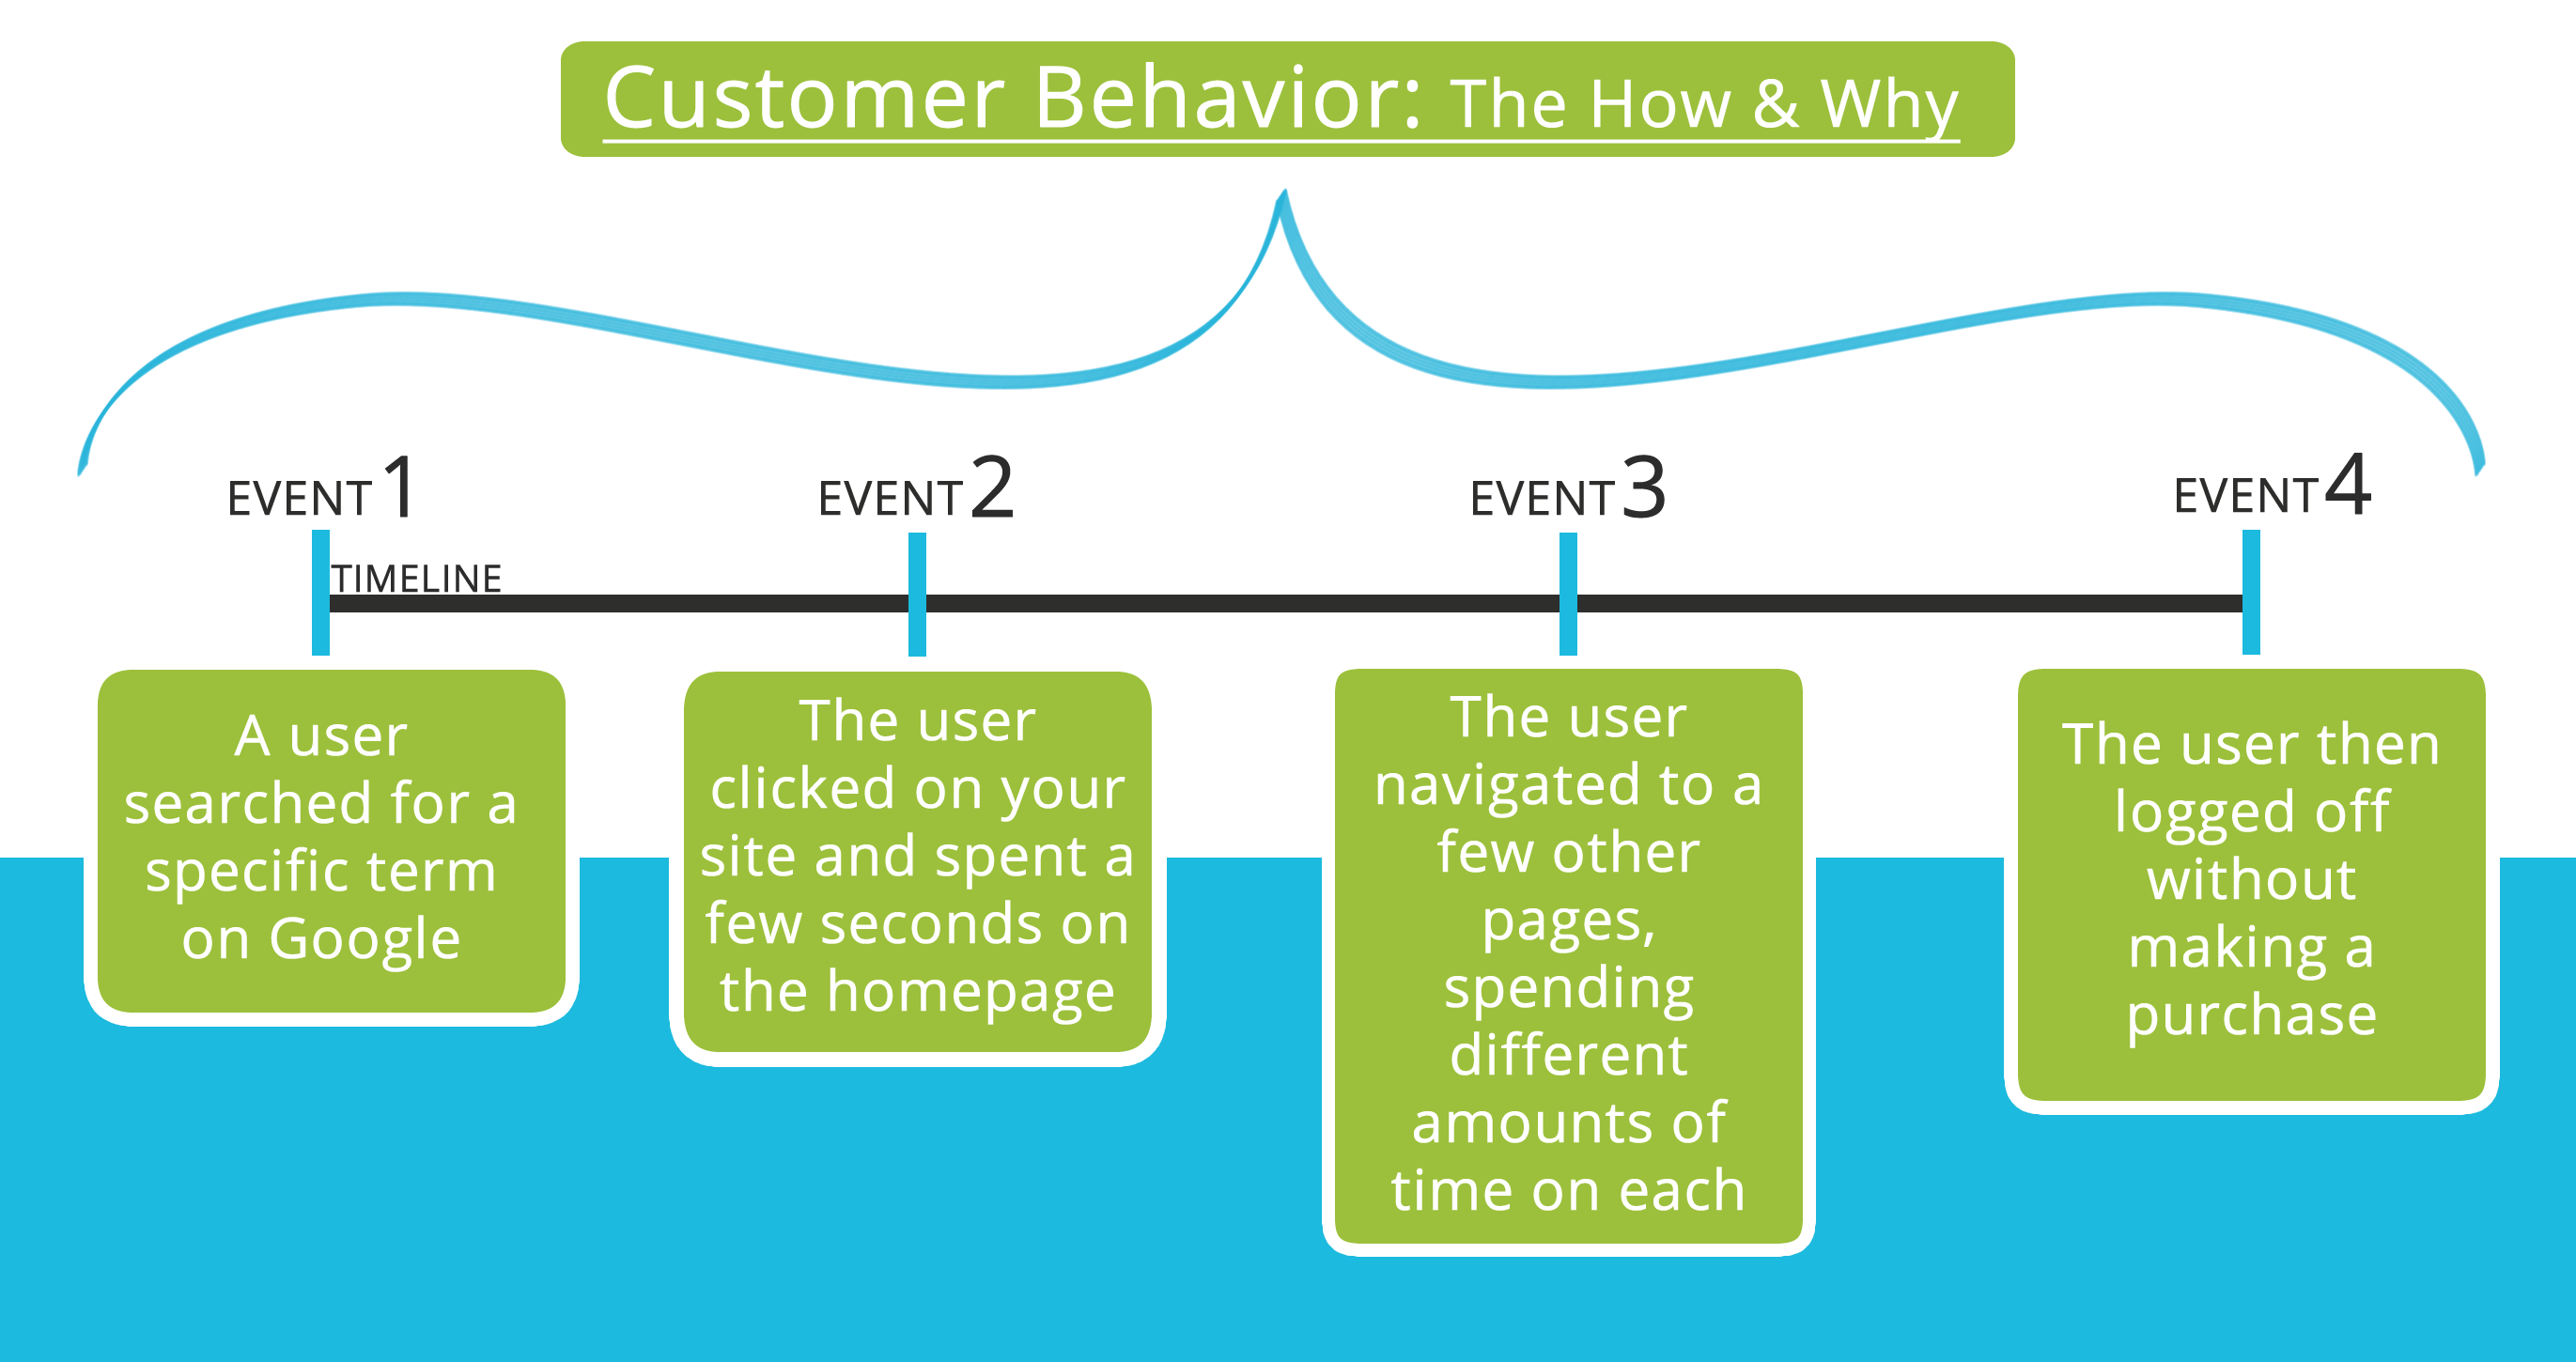 visual_representation_of_events_that_make_up_behavioral_analysis